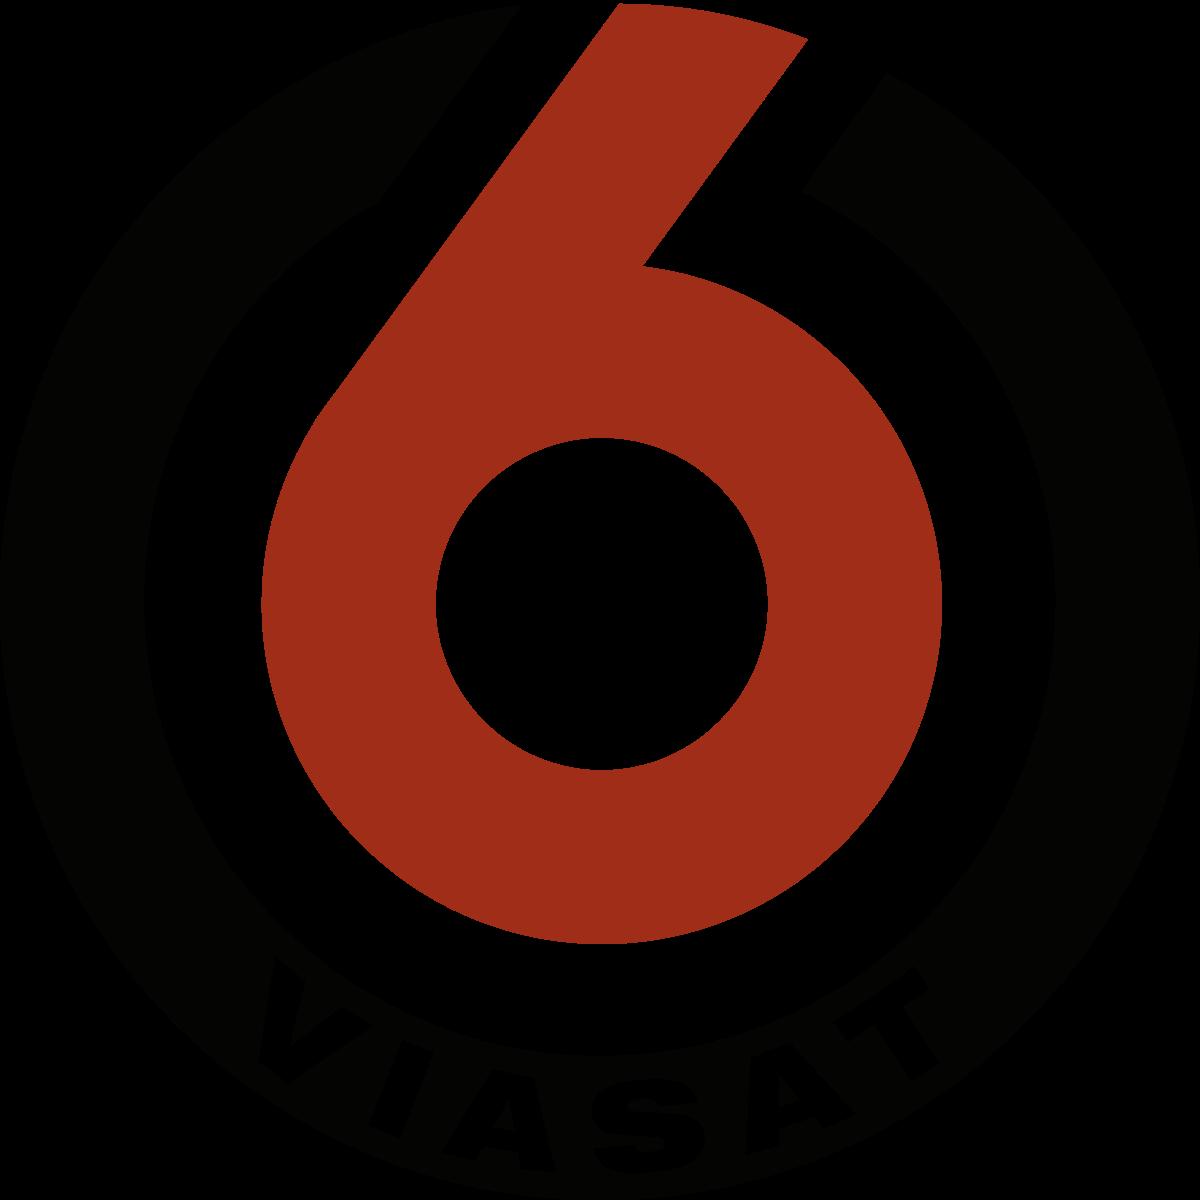 tv6_viasat_svg.png